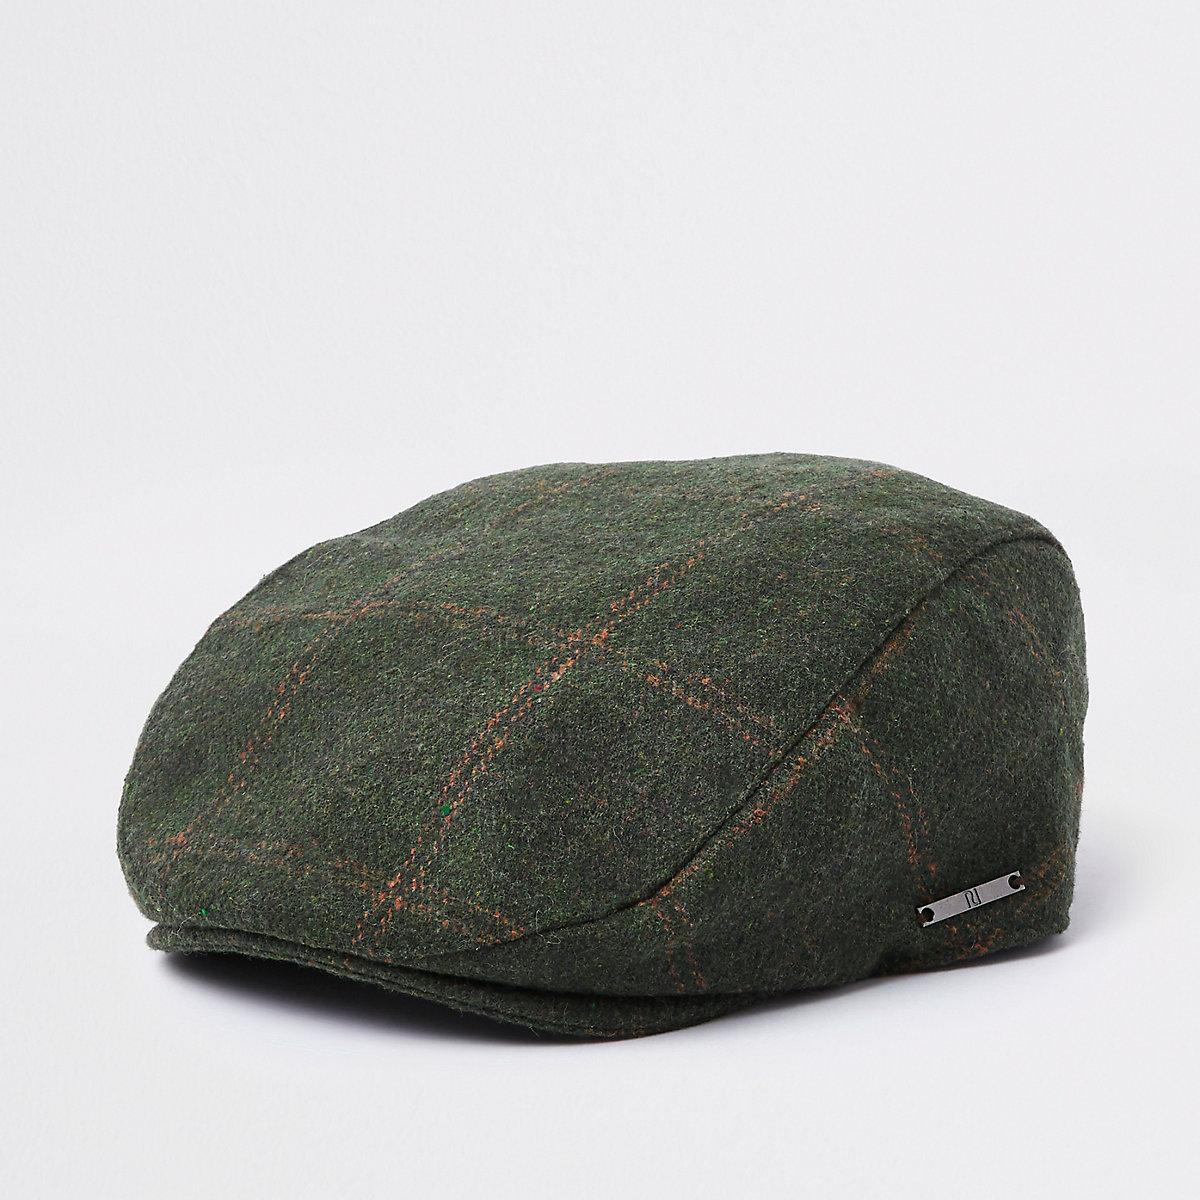 87f0ceb5518bd Boys khaki green check flat peak cap - Hats - Accessories - boys